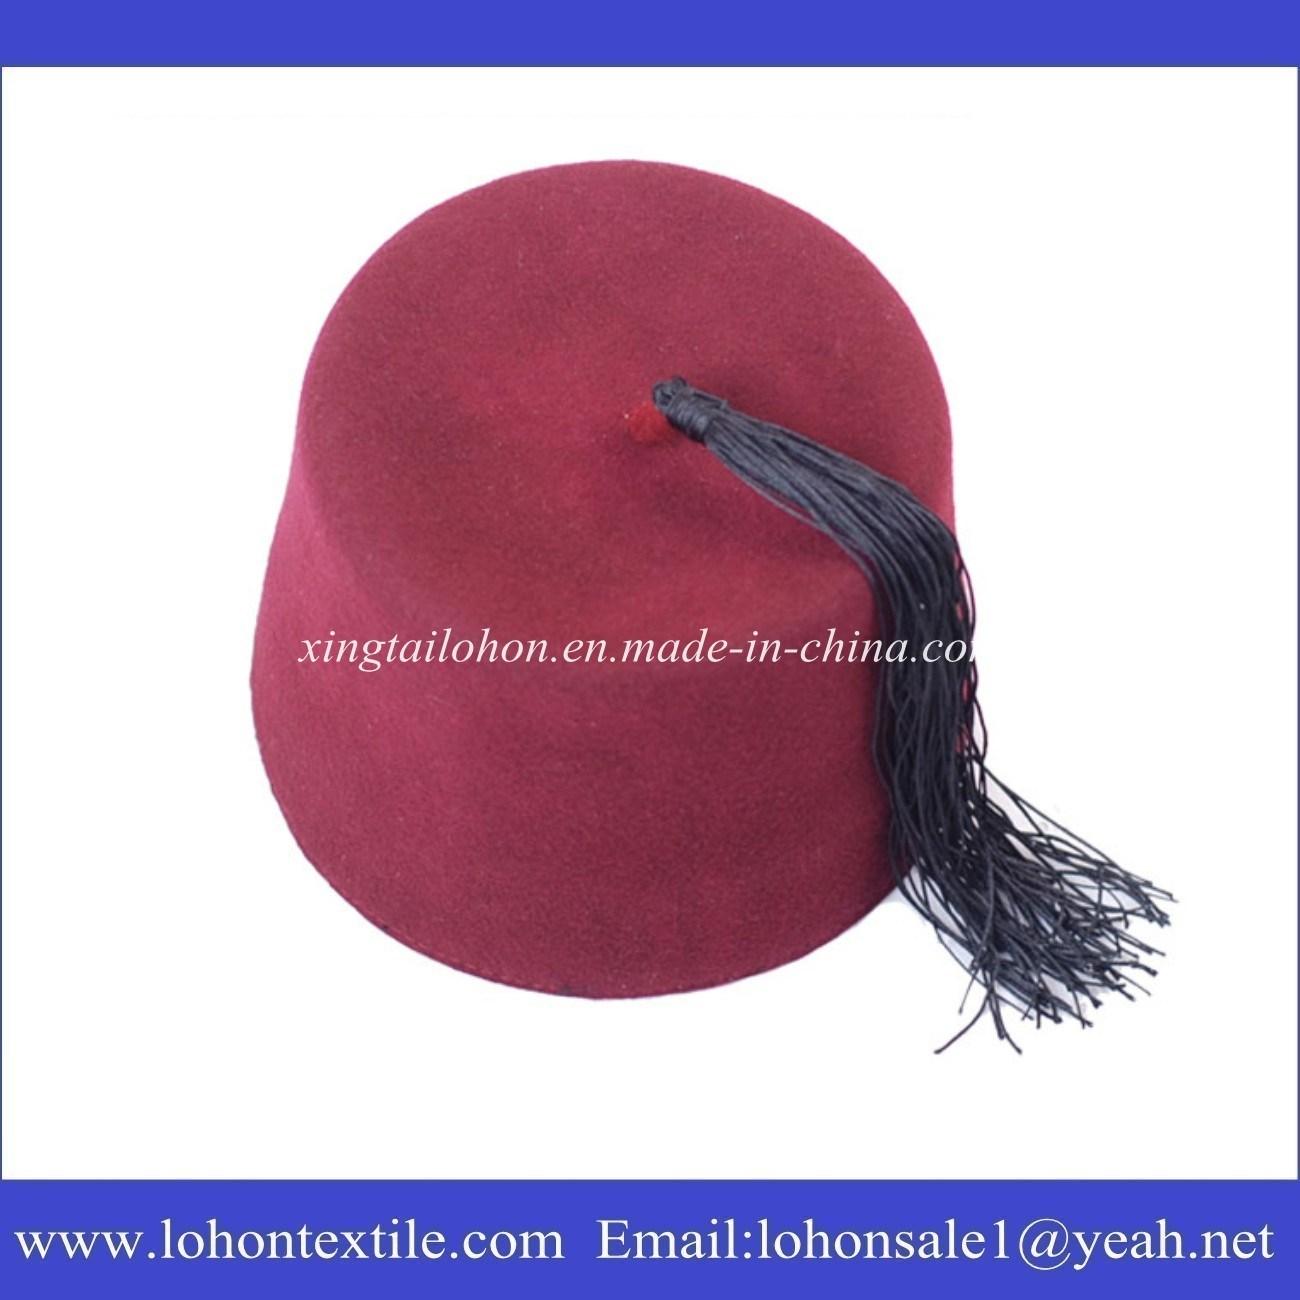 [Hot Item] Muslim Fez Cap Turkish Prayer Hat with Tassel for Middleast Man